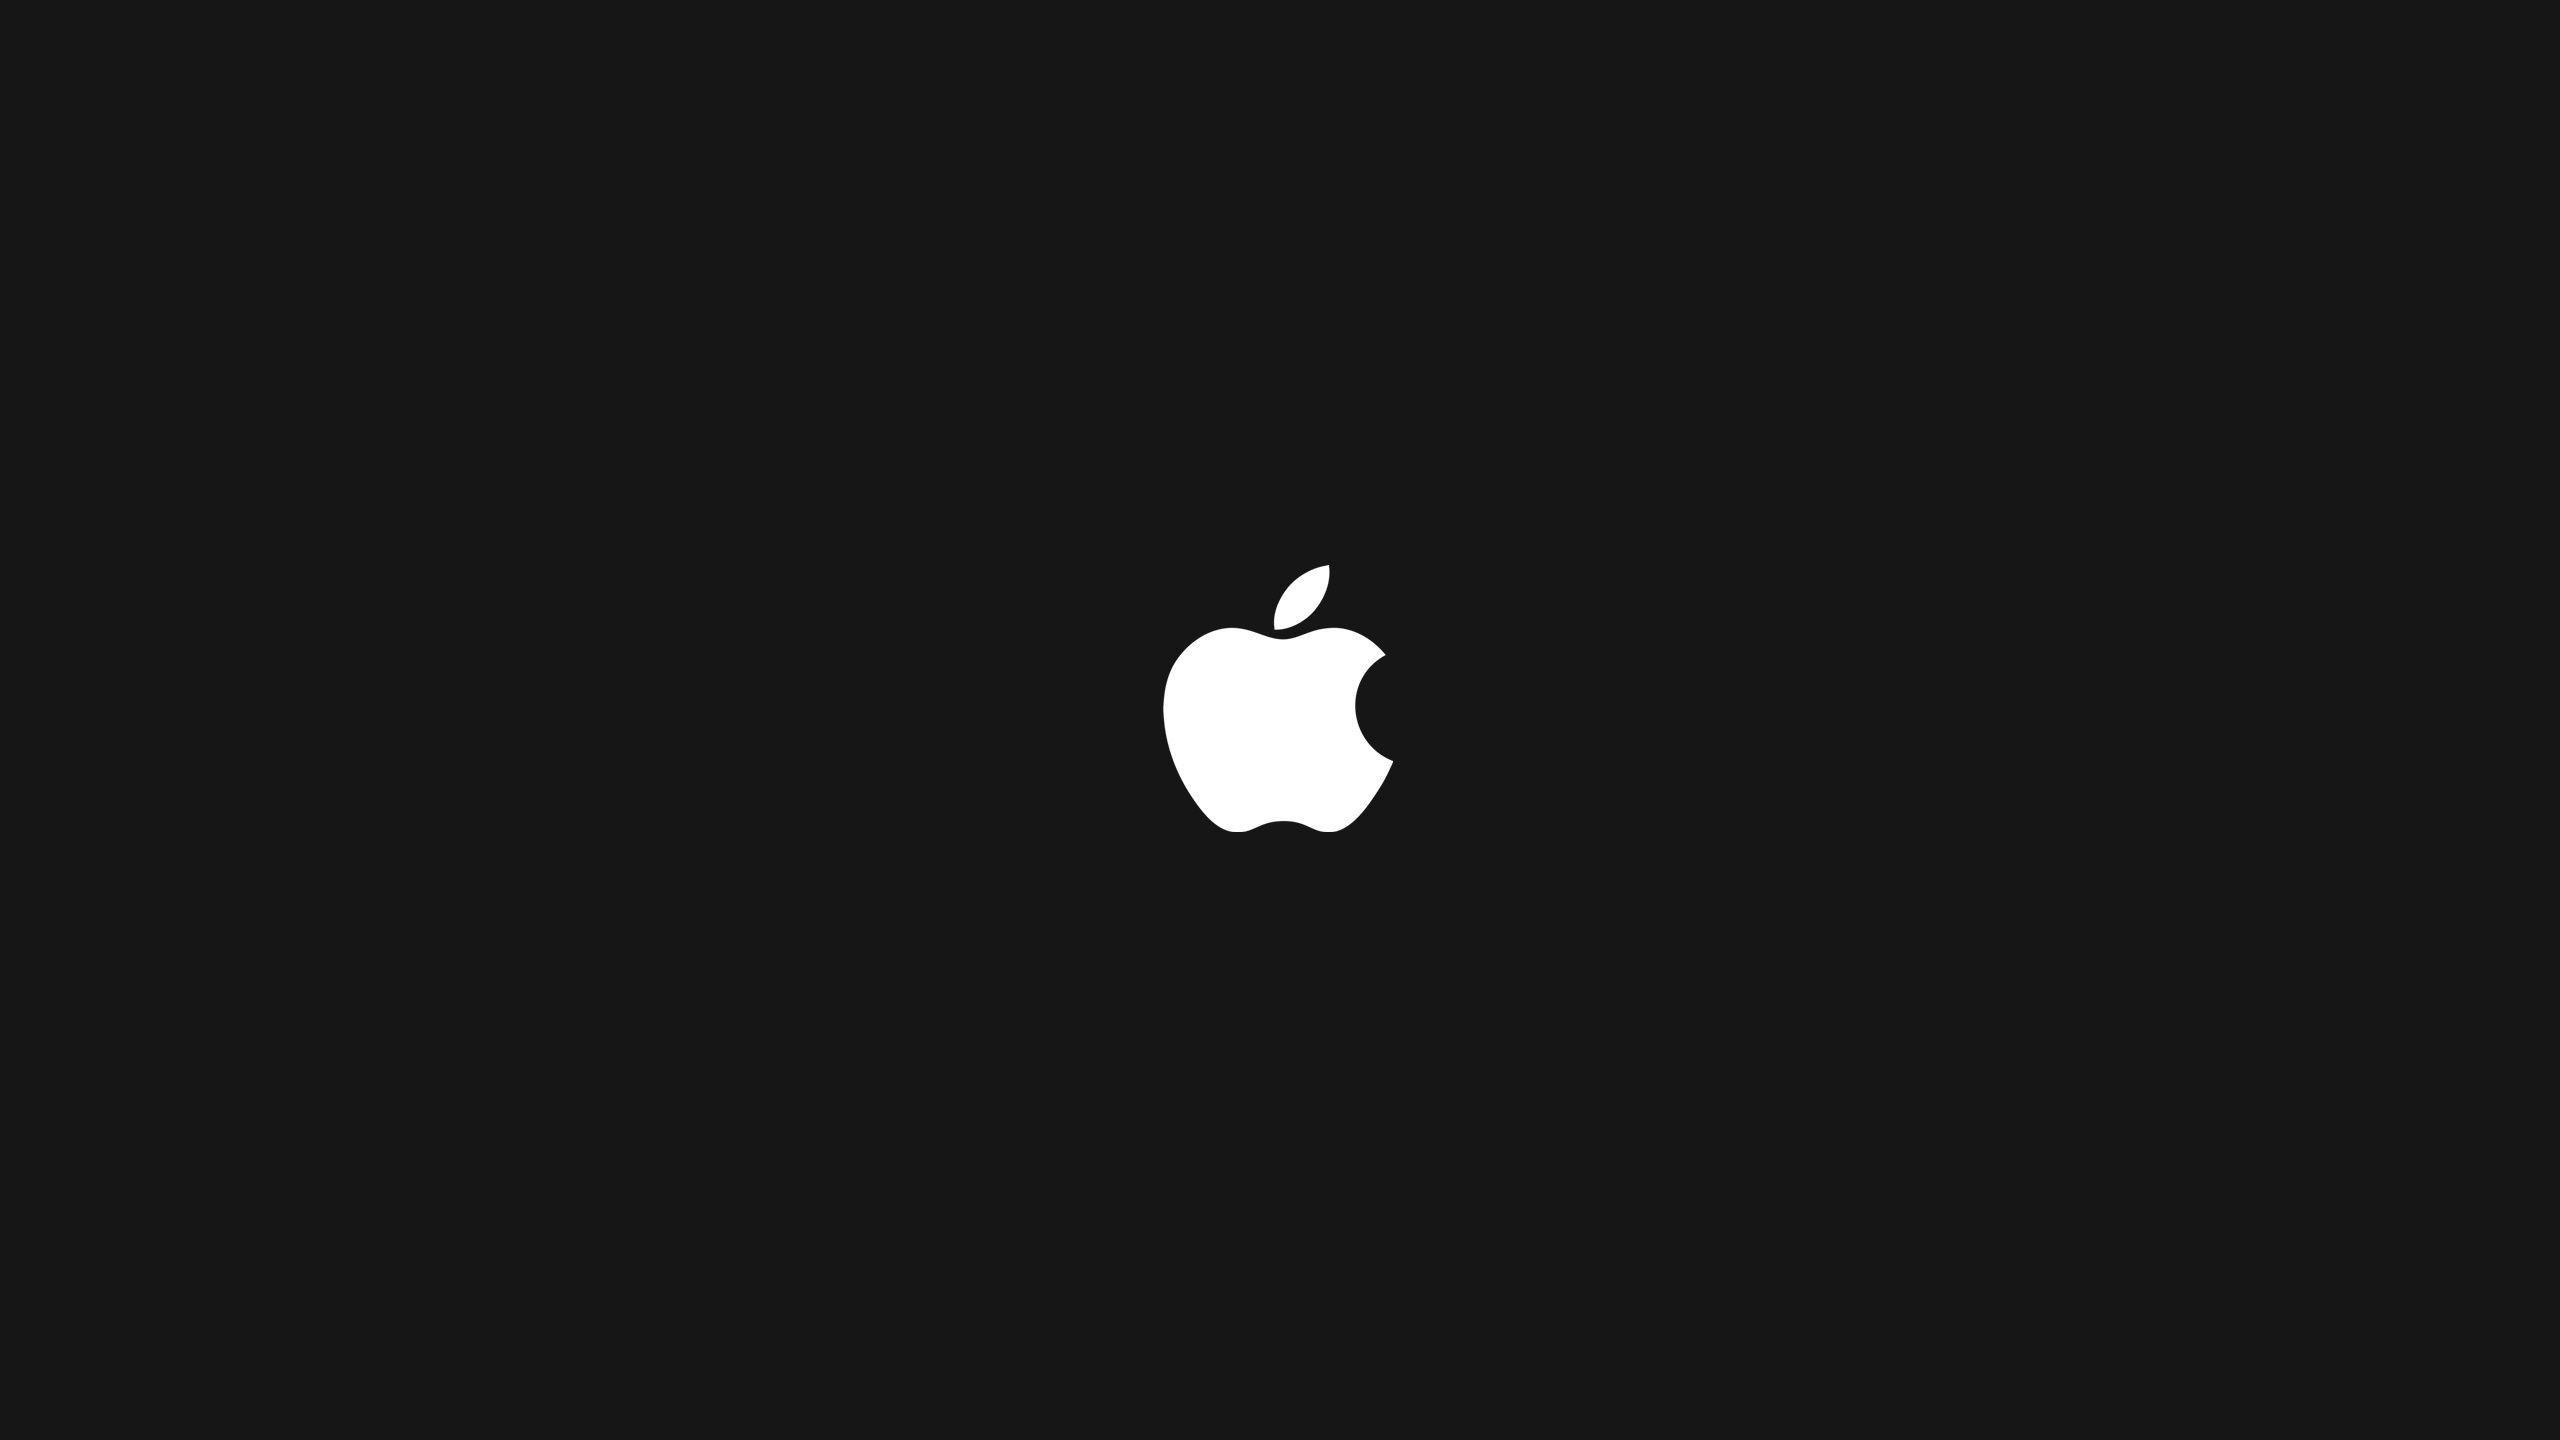 Awesome Black And White Apple Logo Wallpaper Di 2020 Seni